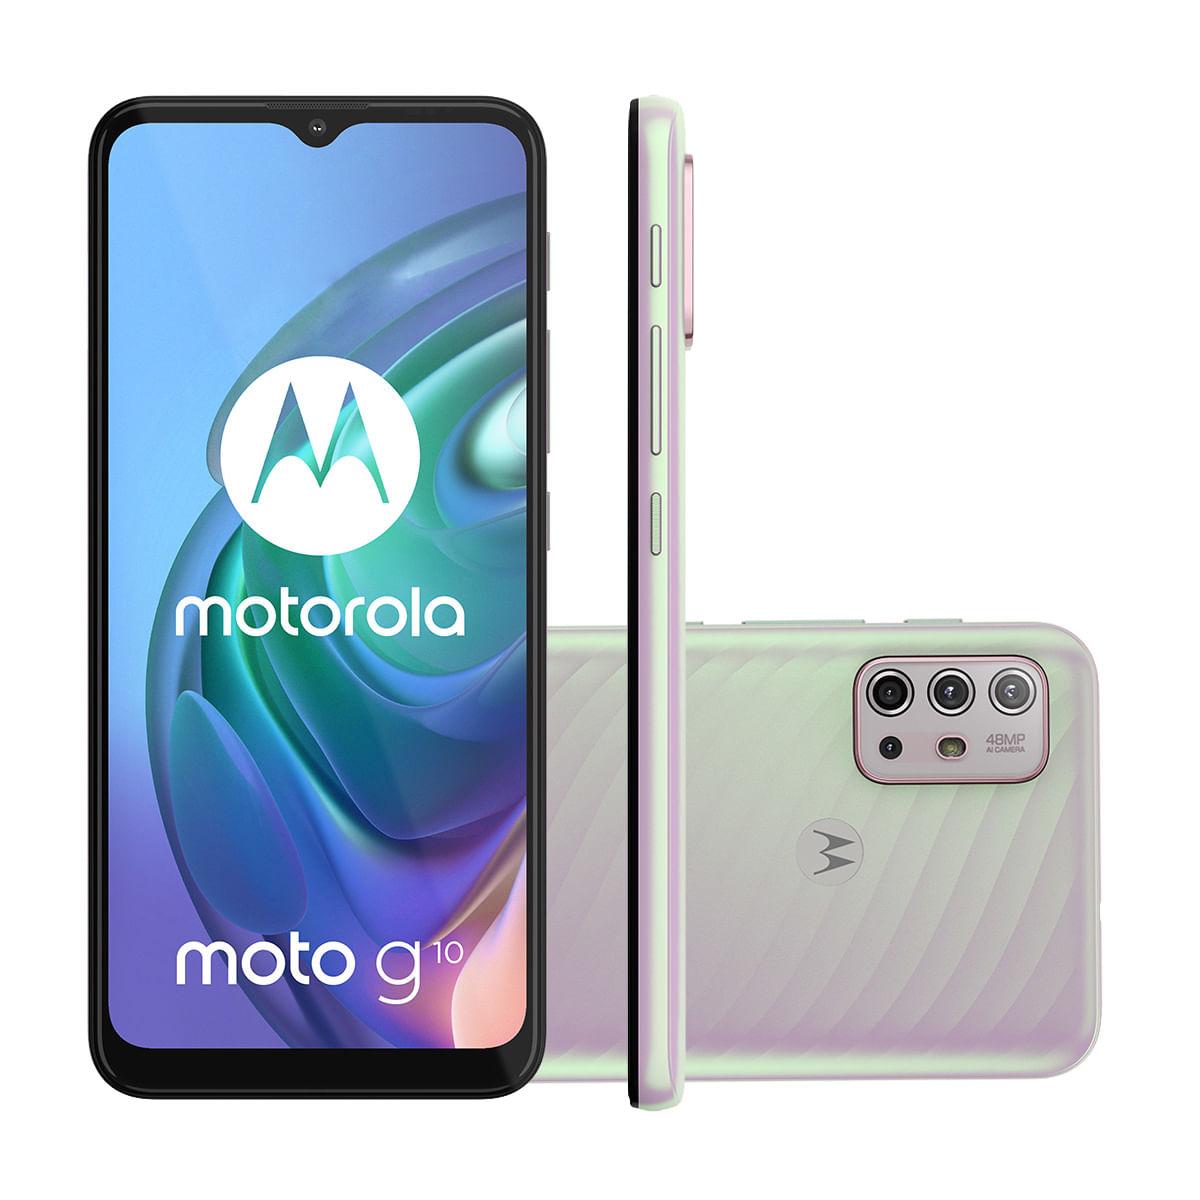 "Smartphone Motorola Moto G10 64GB Branco Floral 4G Tela 6.5"" Câmera Tripla 48MP Selfie 8MP Android 11"